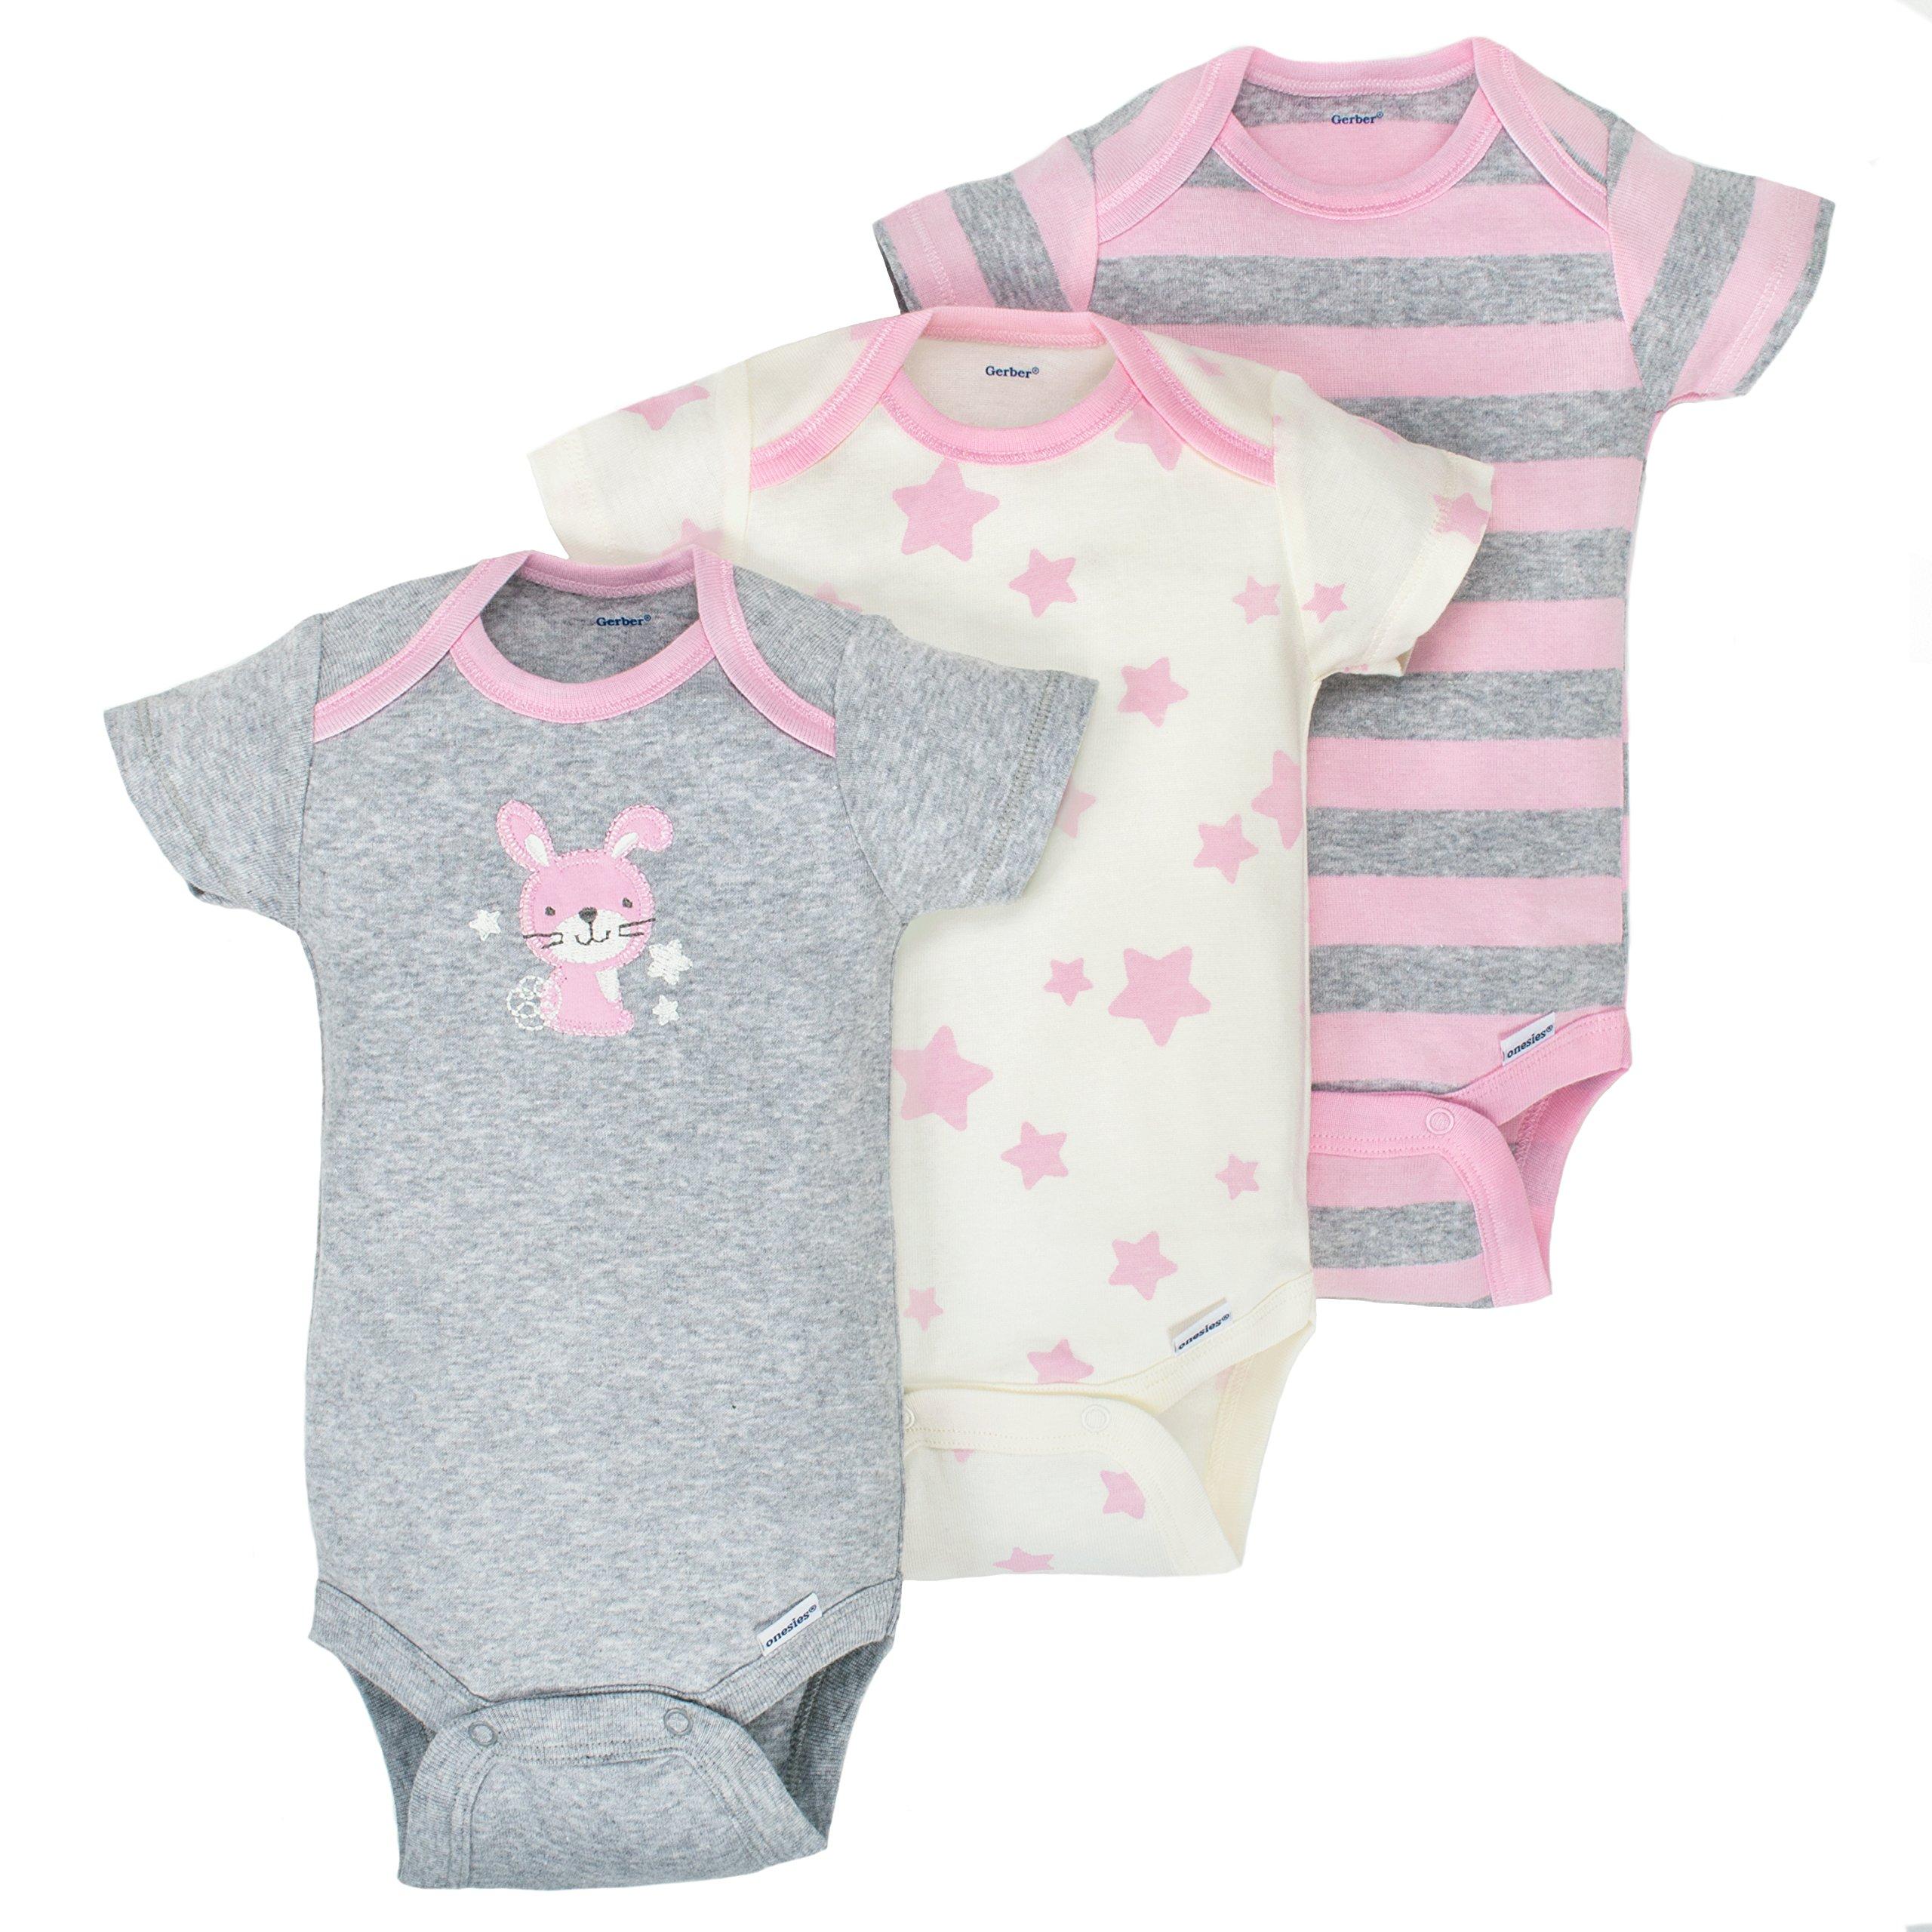 Gerber Baby Girls 3 Pack Organic Short Sleeve Onesies Brand Bodysuit, Gray/Light Pink, 0-3 Months